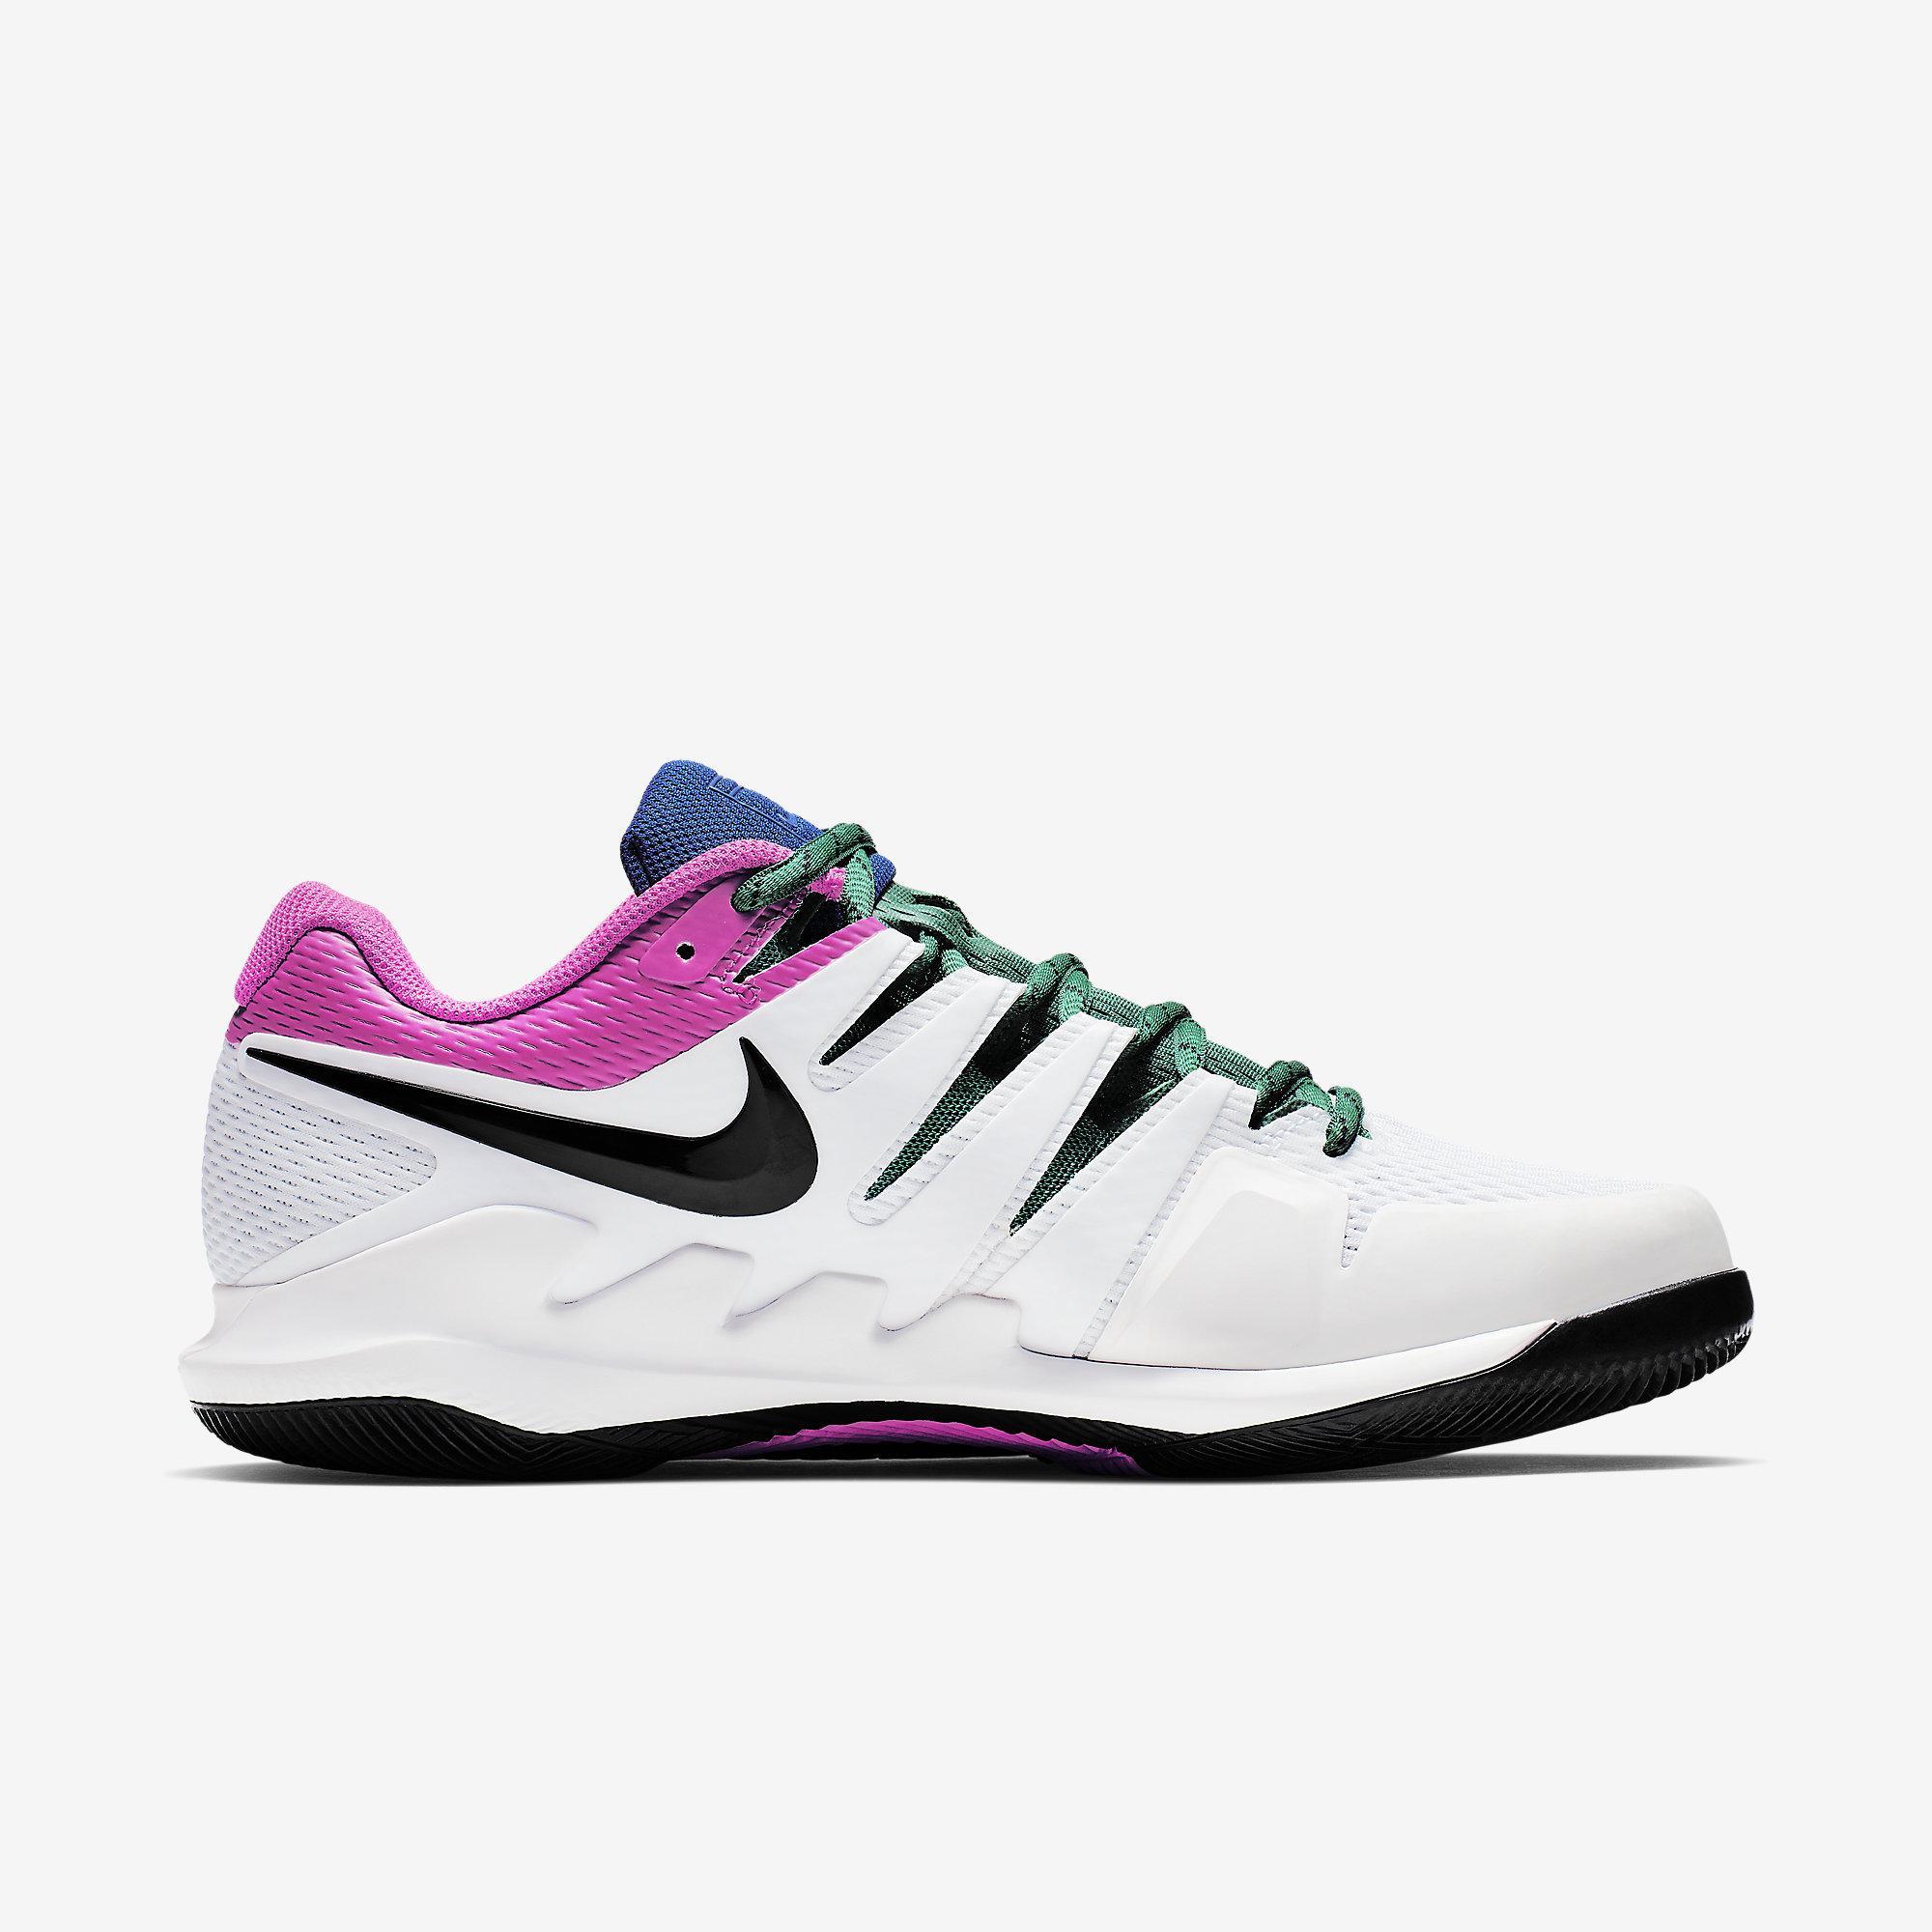 ca96372de875 Nike Mens Air Zoom Vapor X Tennis Shoes - White Multi-Colour ...